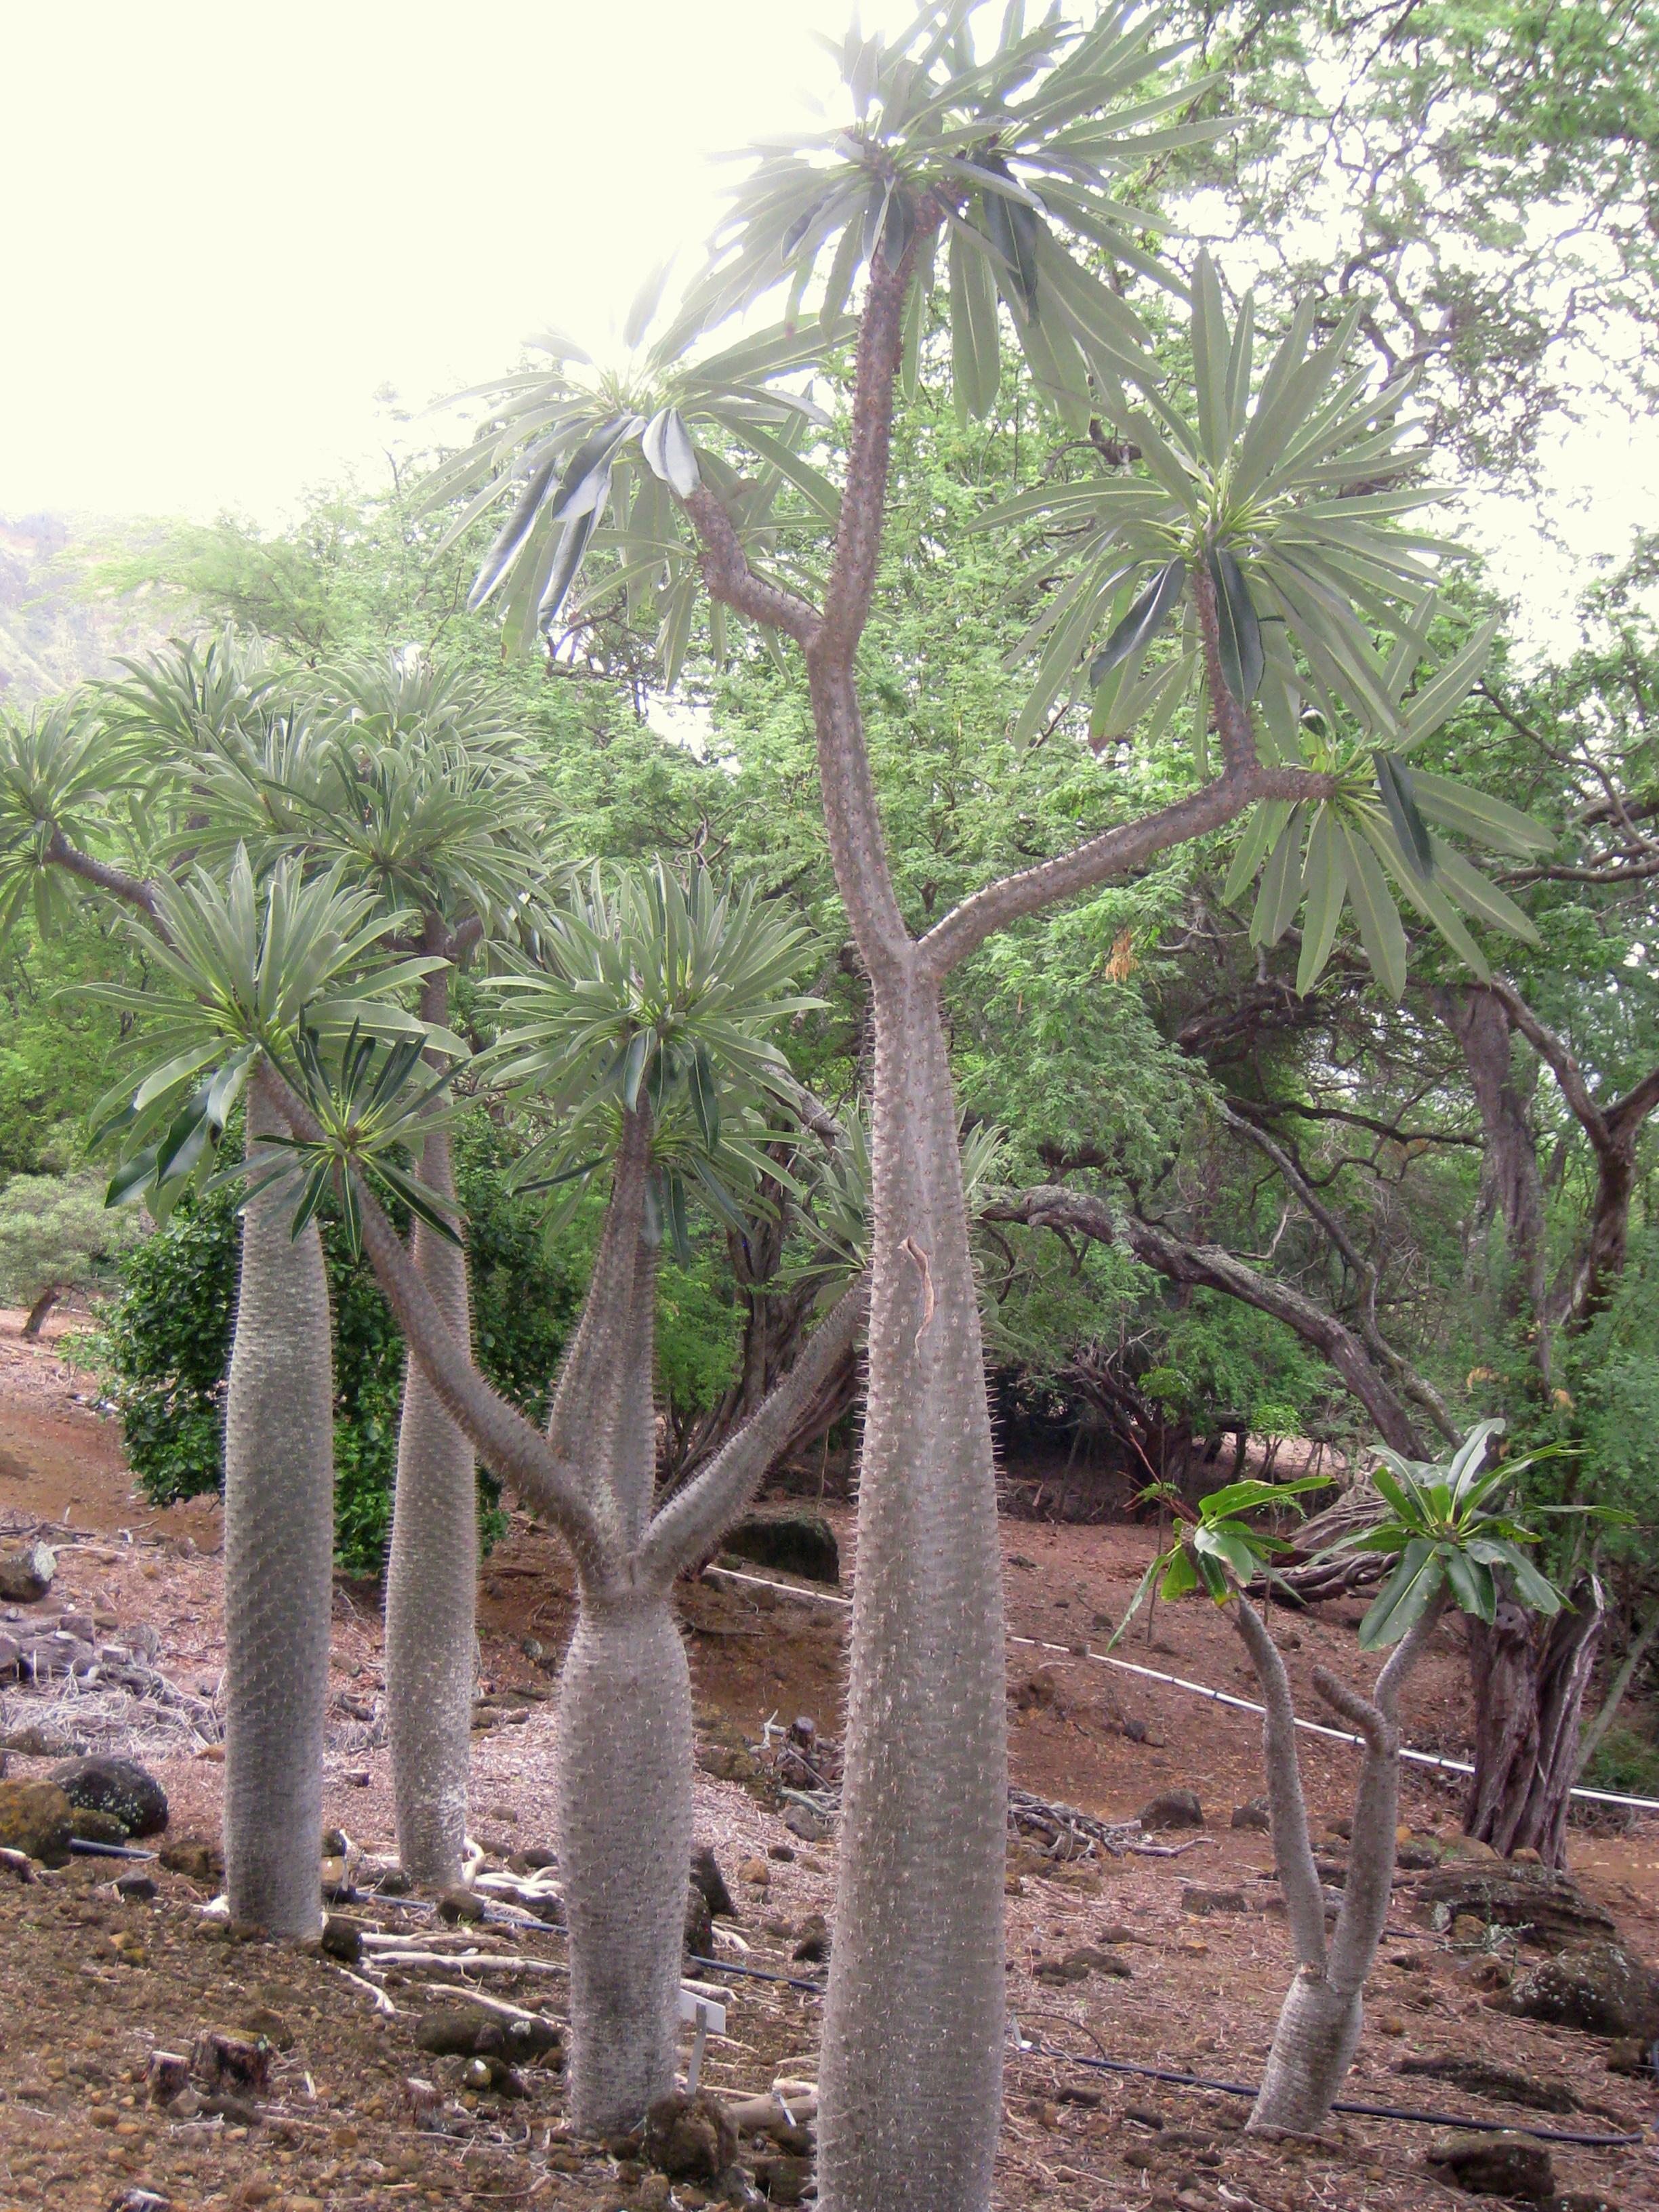 Datei Pachypodium Lamerei Var Ramosum Koko Crater Botanical Garden Img 2279 Jpg Wikipedia